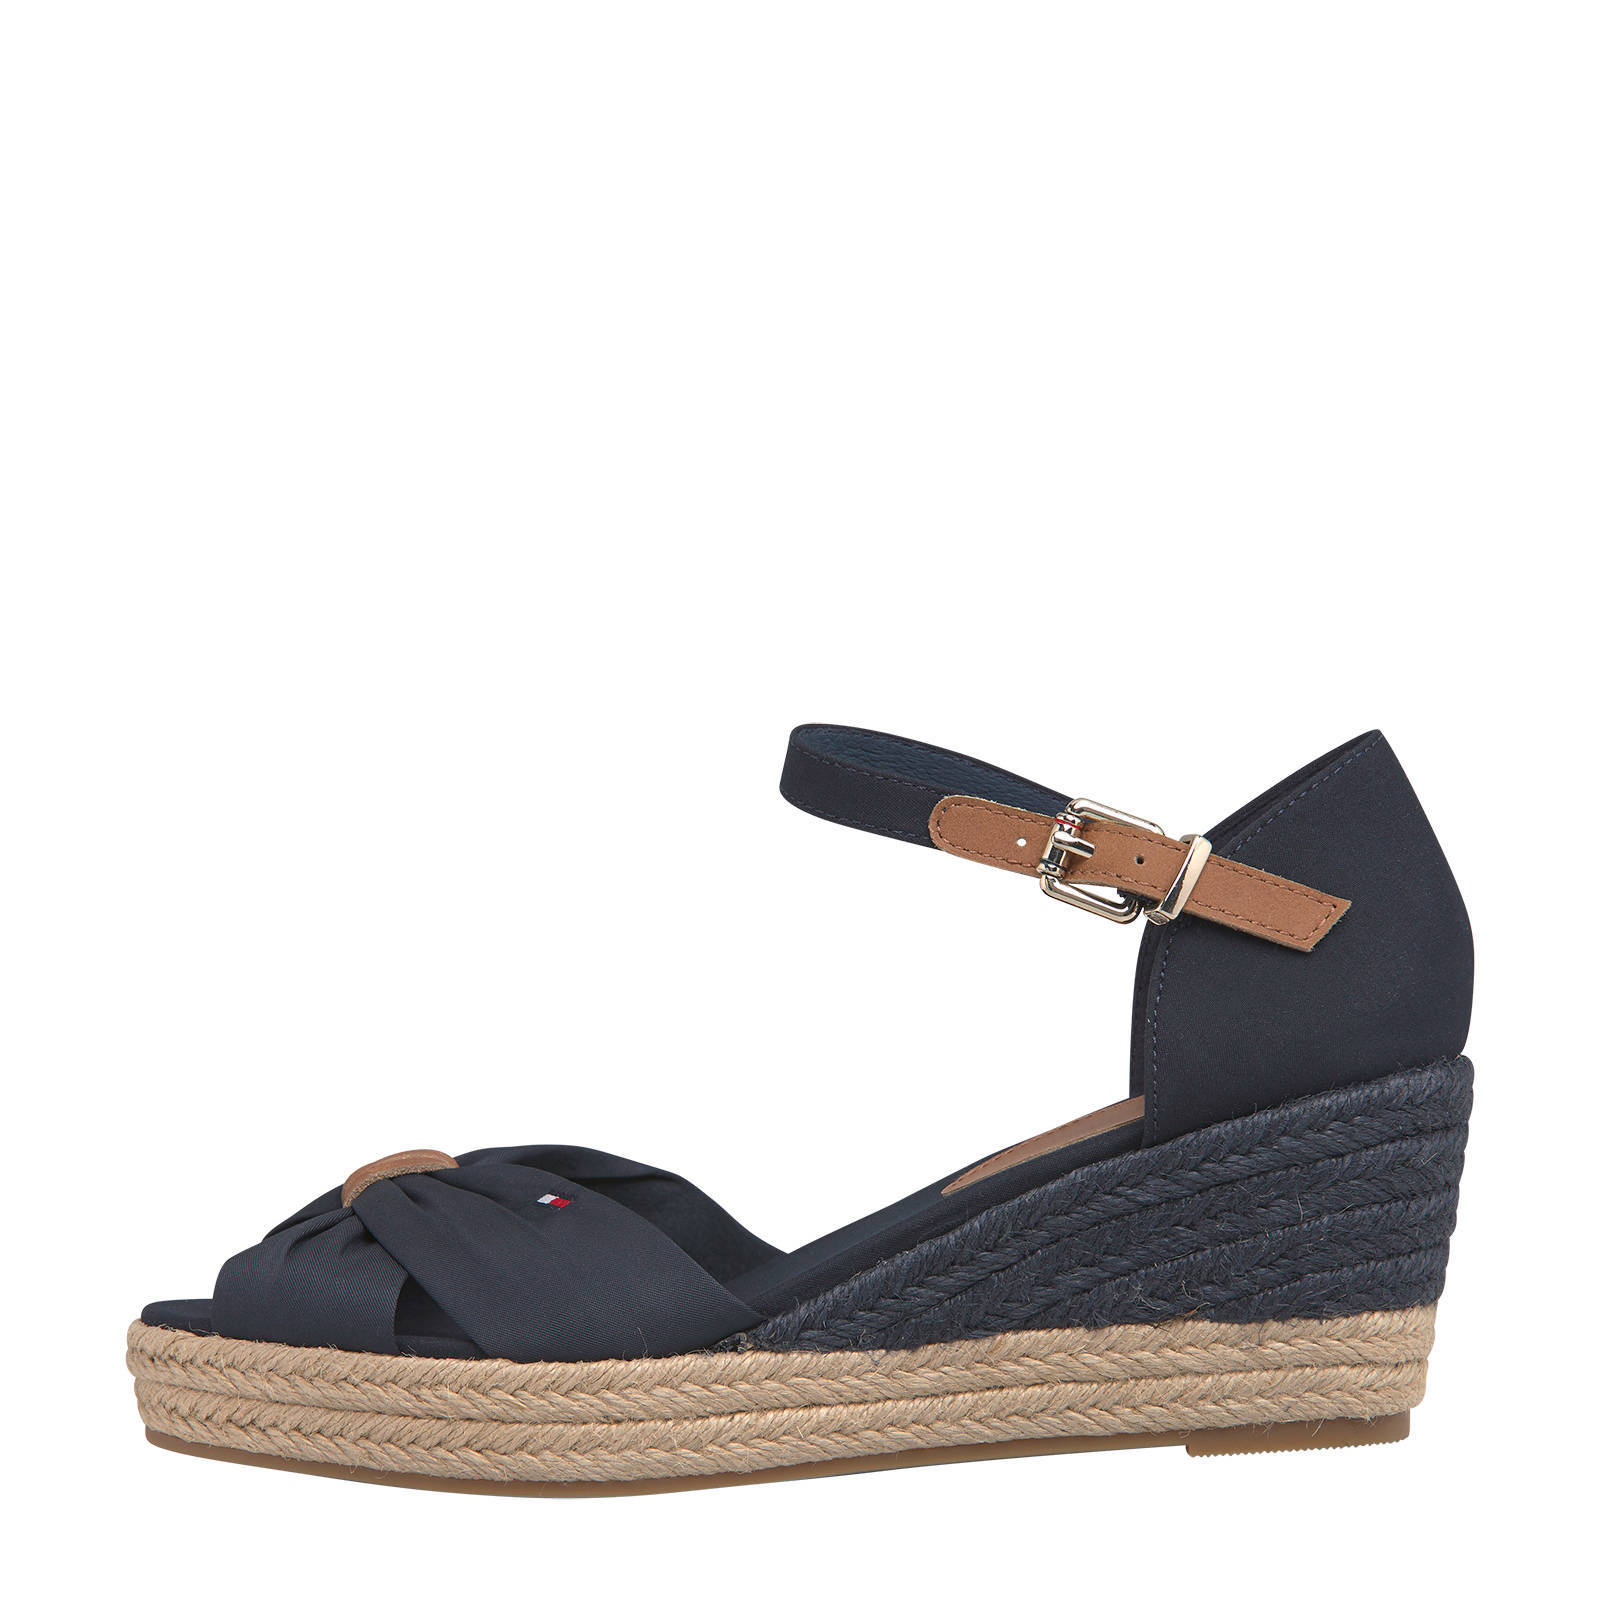 Tommy Hilfiger Basic Open Toe Mid Wedge sleehakken donkerblauw online kopen